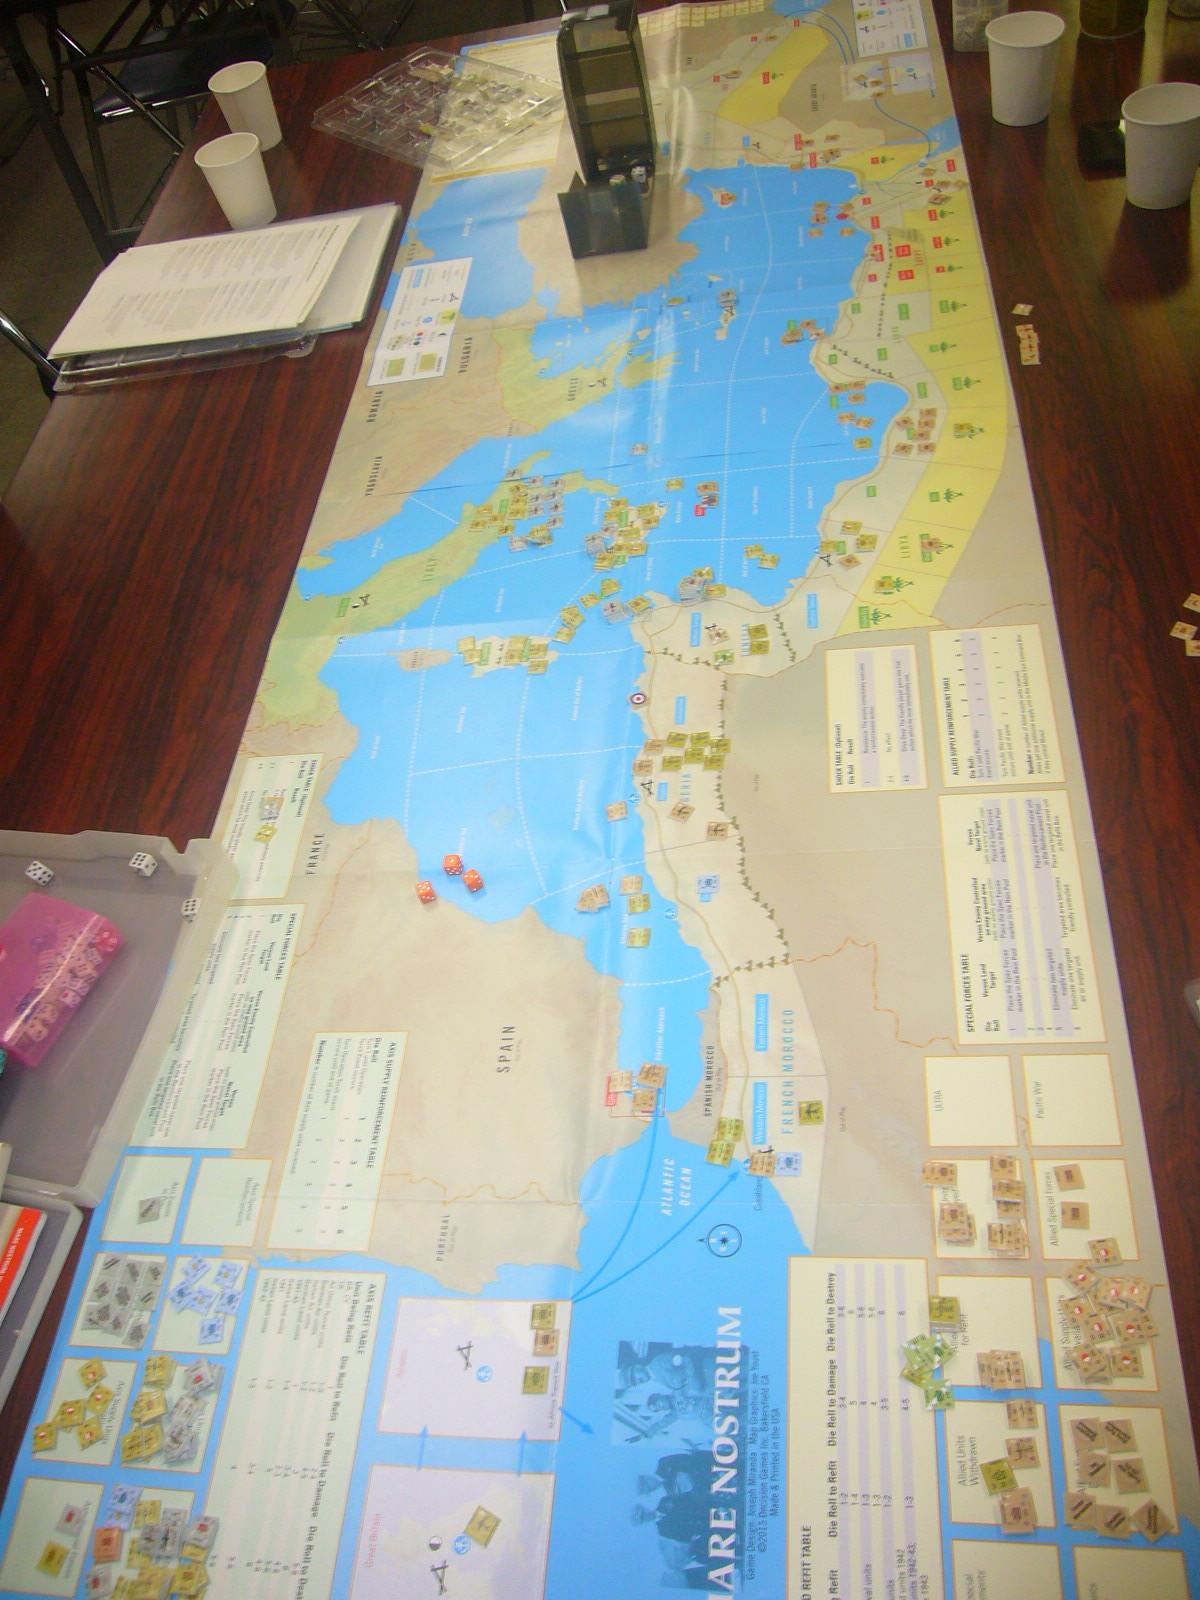 YSGA8月例会の様子その5〔これもひとつの地中海キャンペーン:(WaW誌)Mare Nostrum: War in the Mediterranean〕_b0173672_20091802.jpg